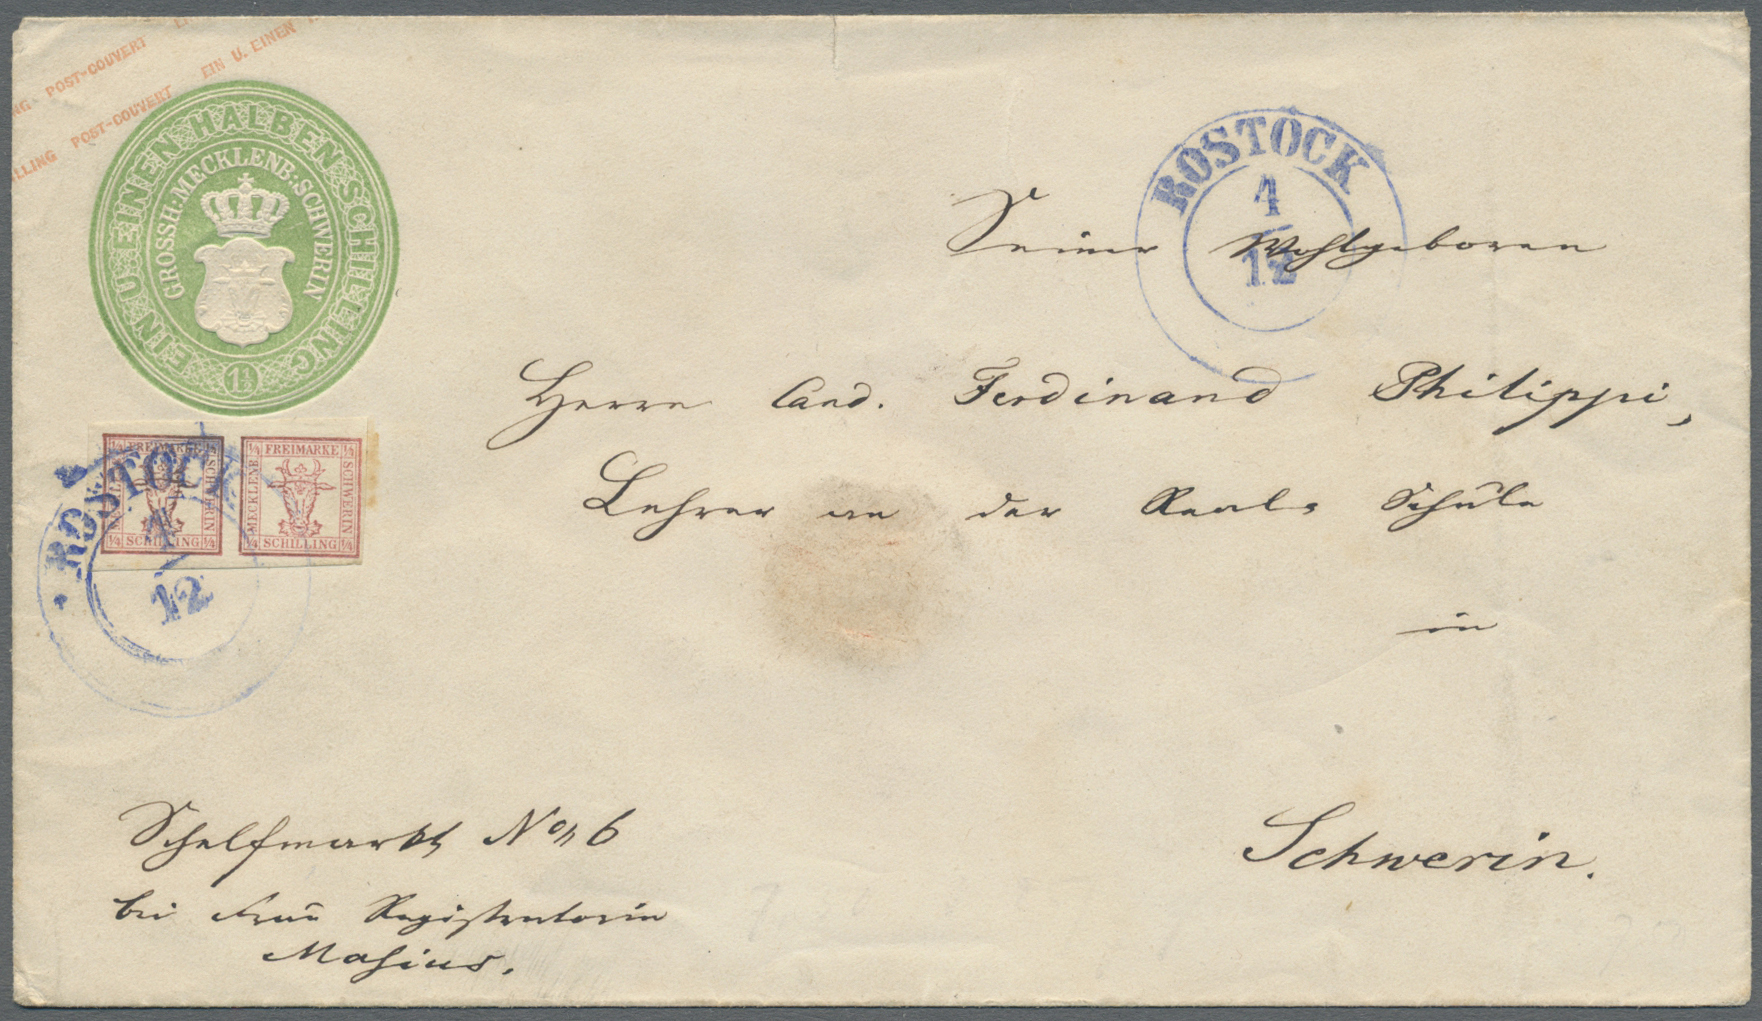 Lot 36213 - altdeutschland und deutsches reich  -  Auktionshaus Christoph Gärtner GmbH & Co. KG Collections Germany,  Collections Supplement, Surprise boxes #39 Day 7